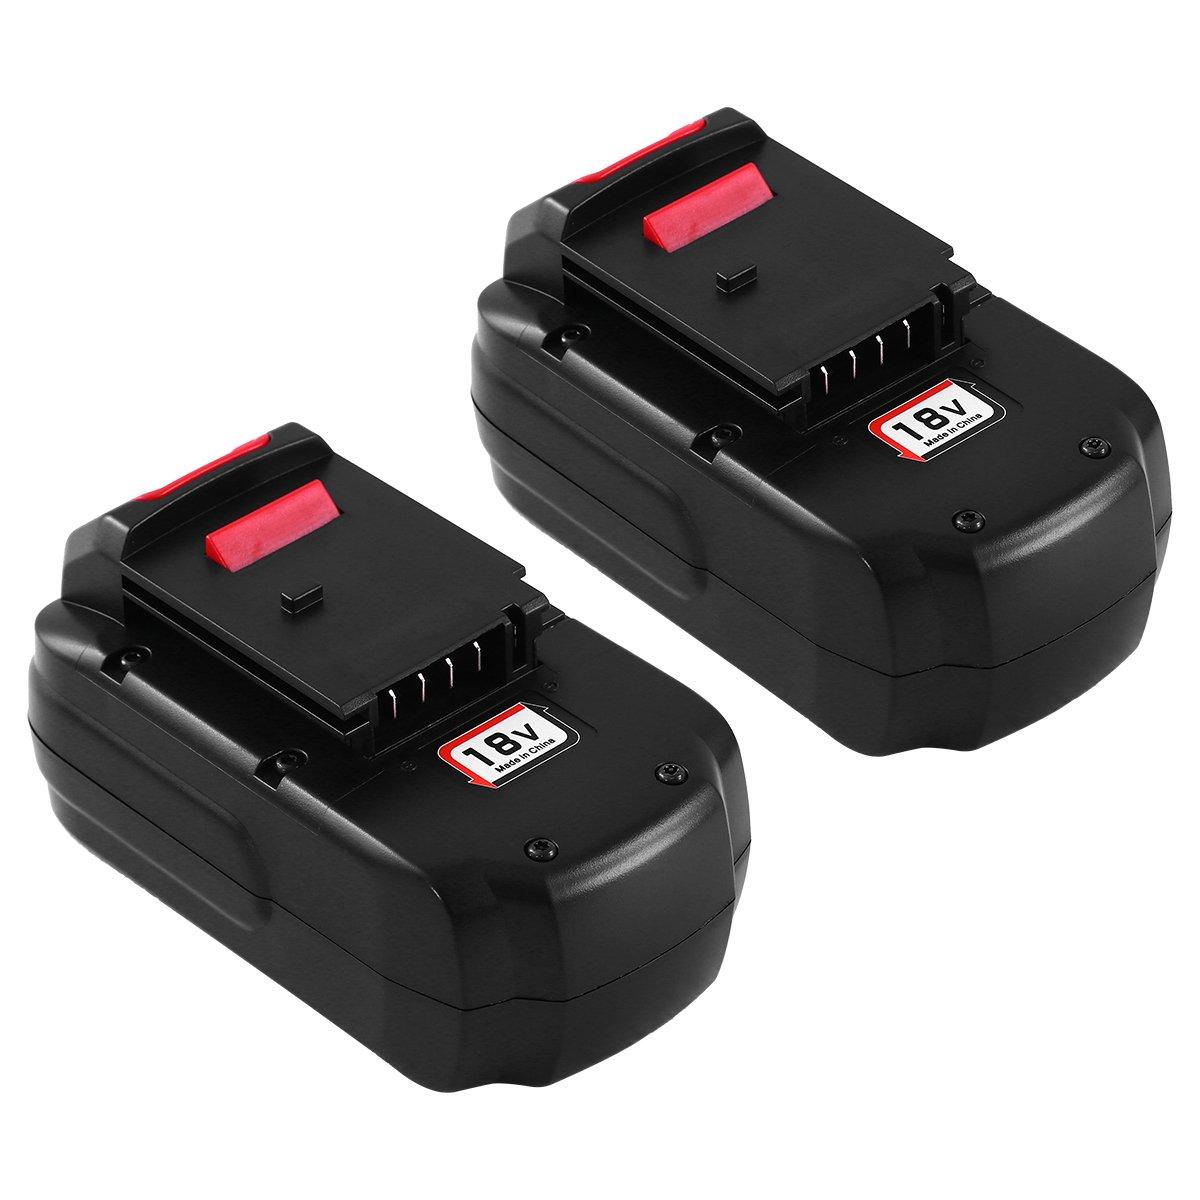 Replace for PC18B Porter Cable 18V Battery PCC489N NI-MH 3.0Ah PC188 PCMVC PCXMVC 2Packs Cordless Tools Batteries SUN POWER